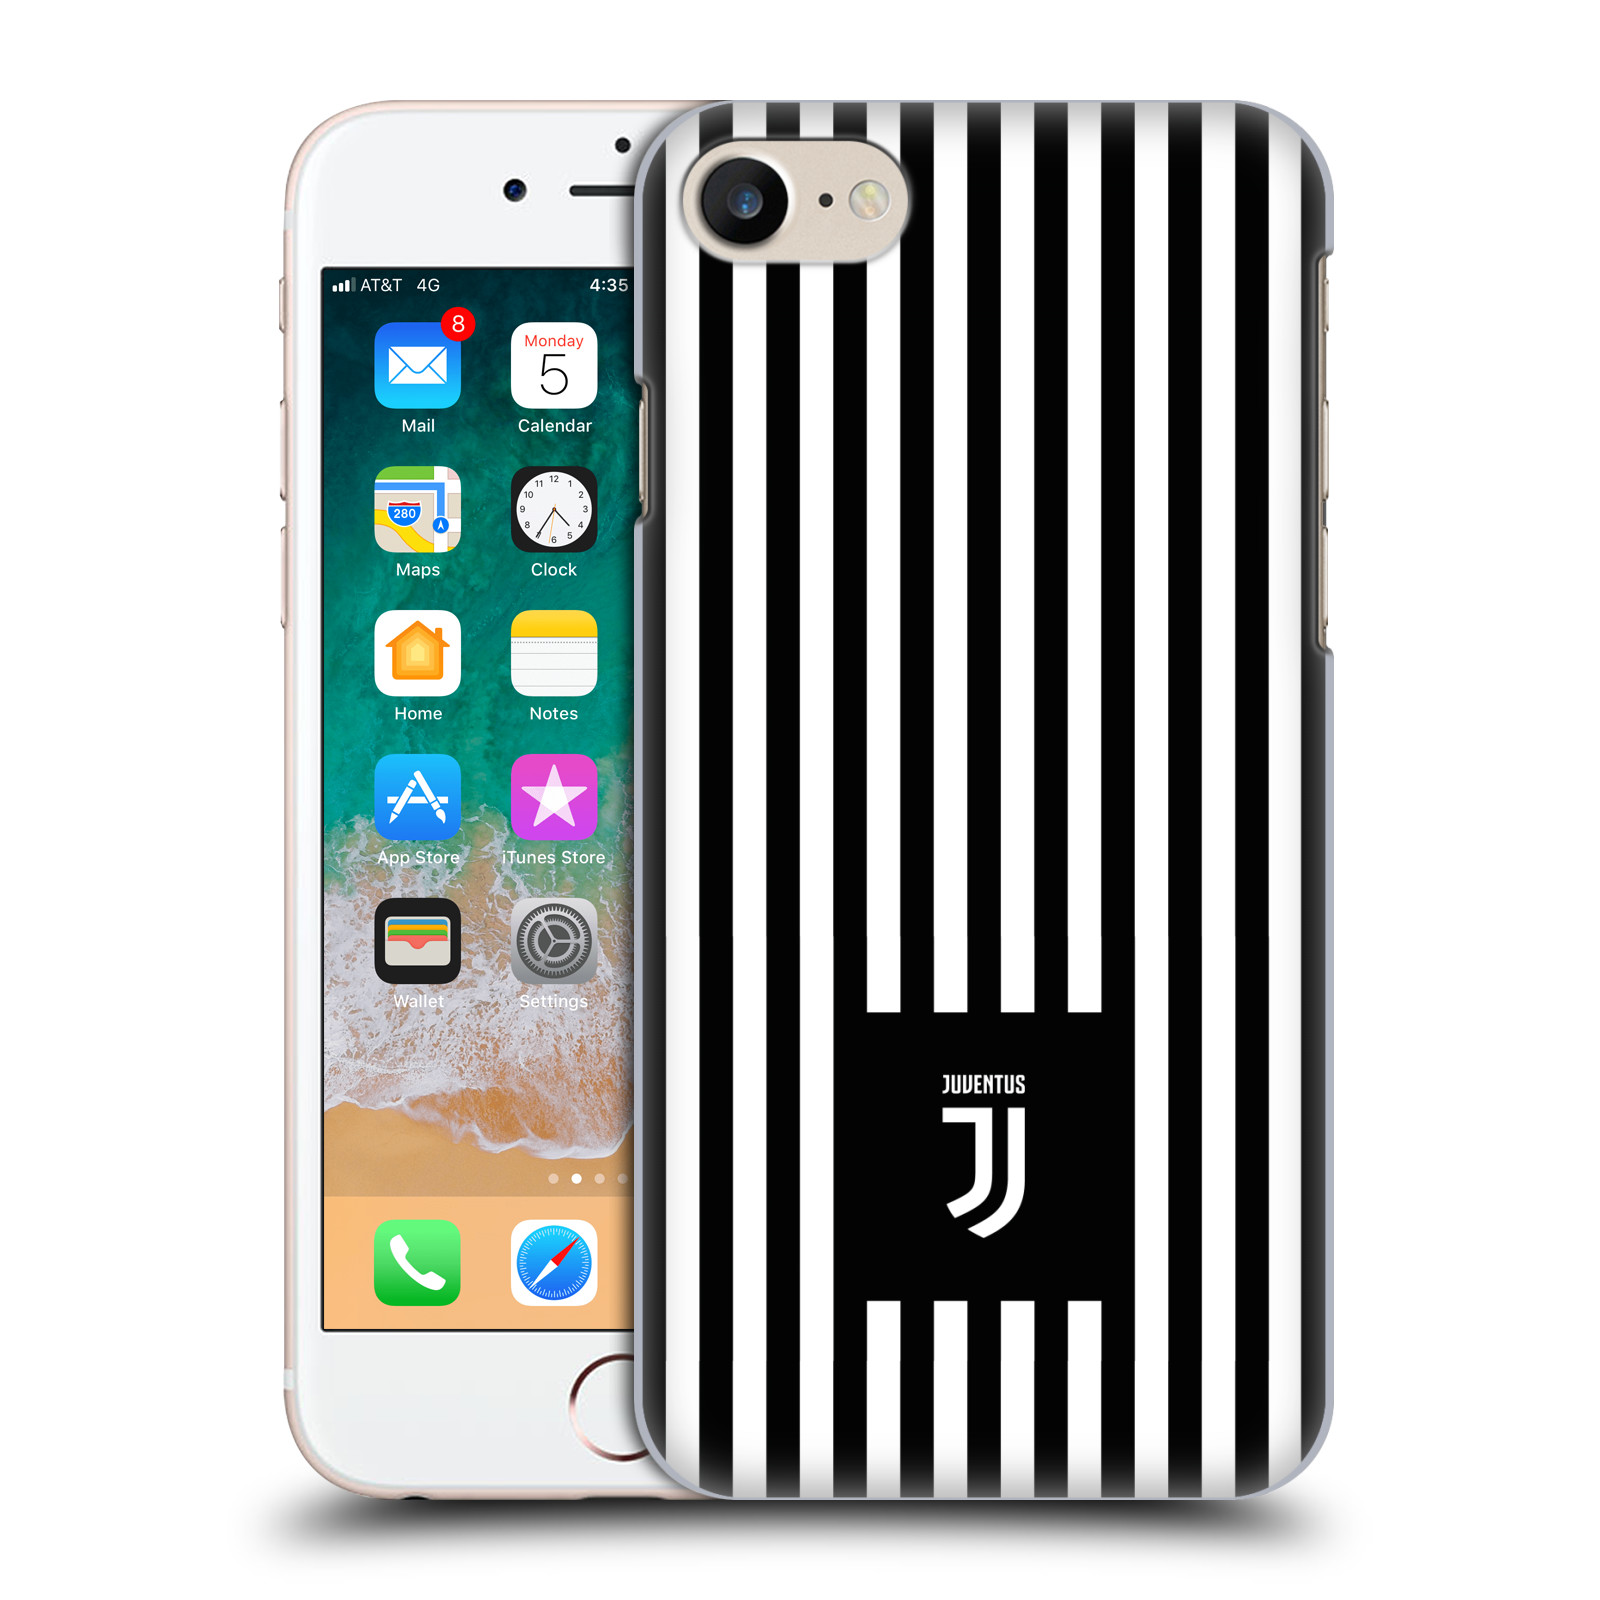 Plastové pouzdro na mobil Apple iPhone 7 - Head Case - Juventus FC - Nové logo - Pruhy